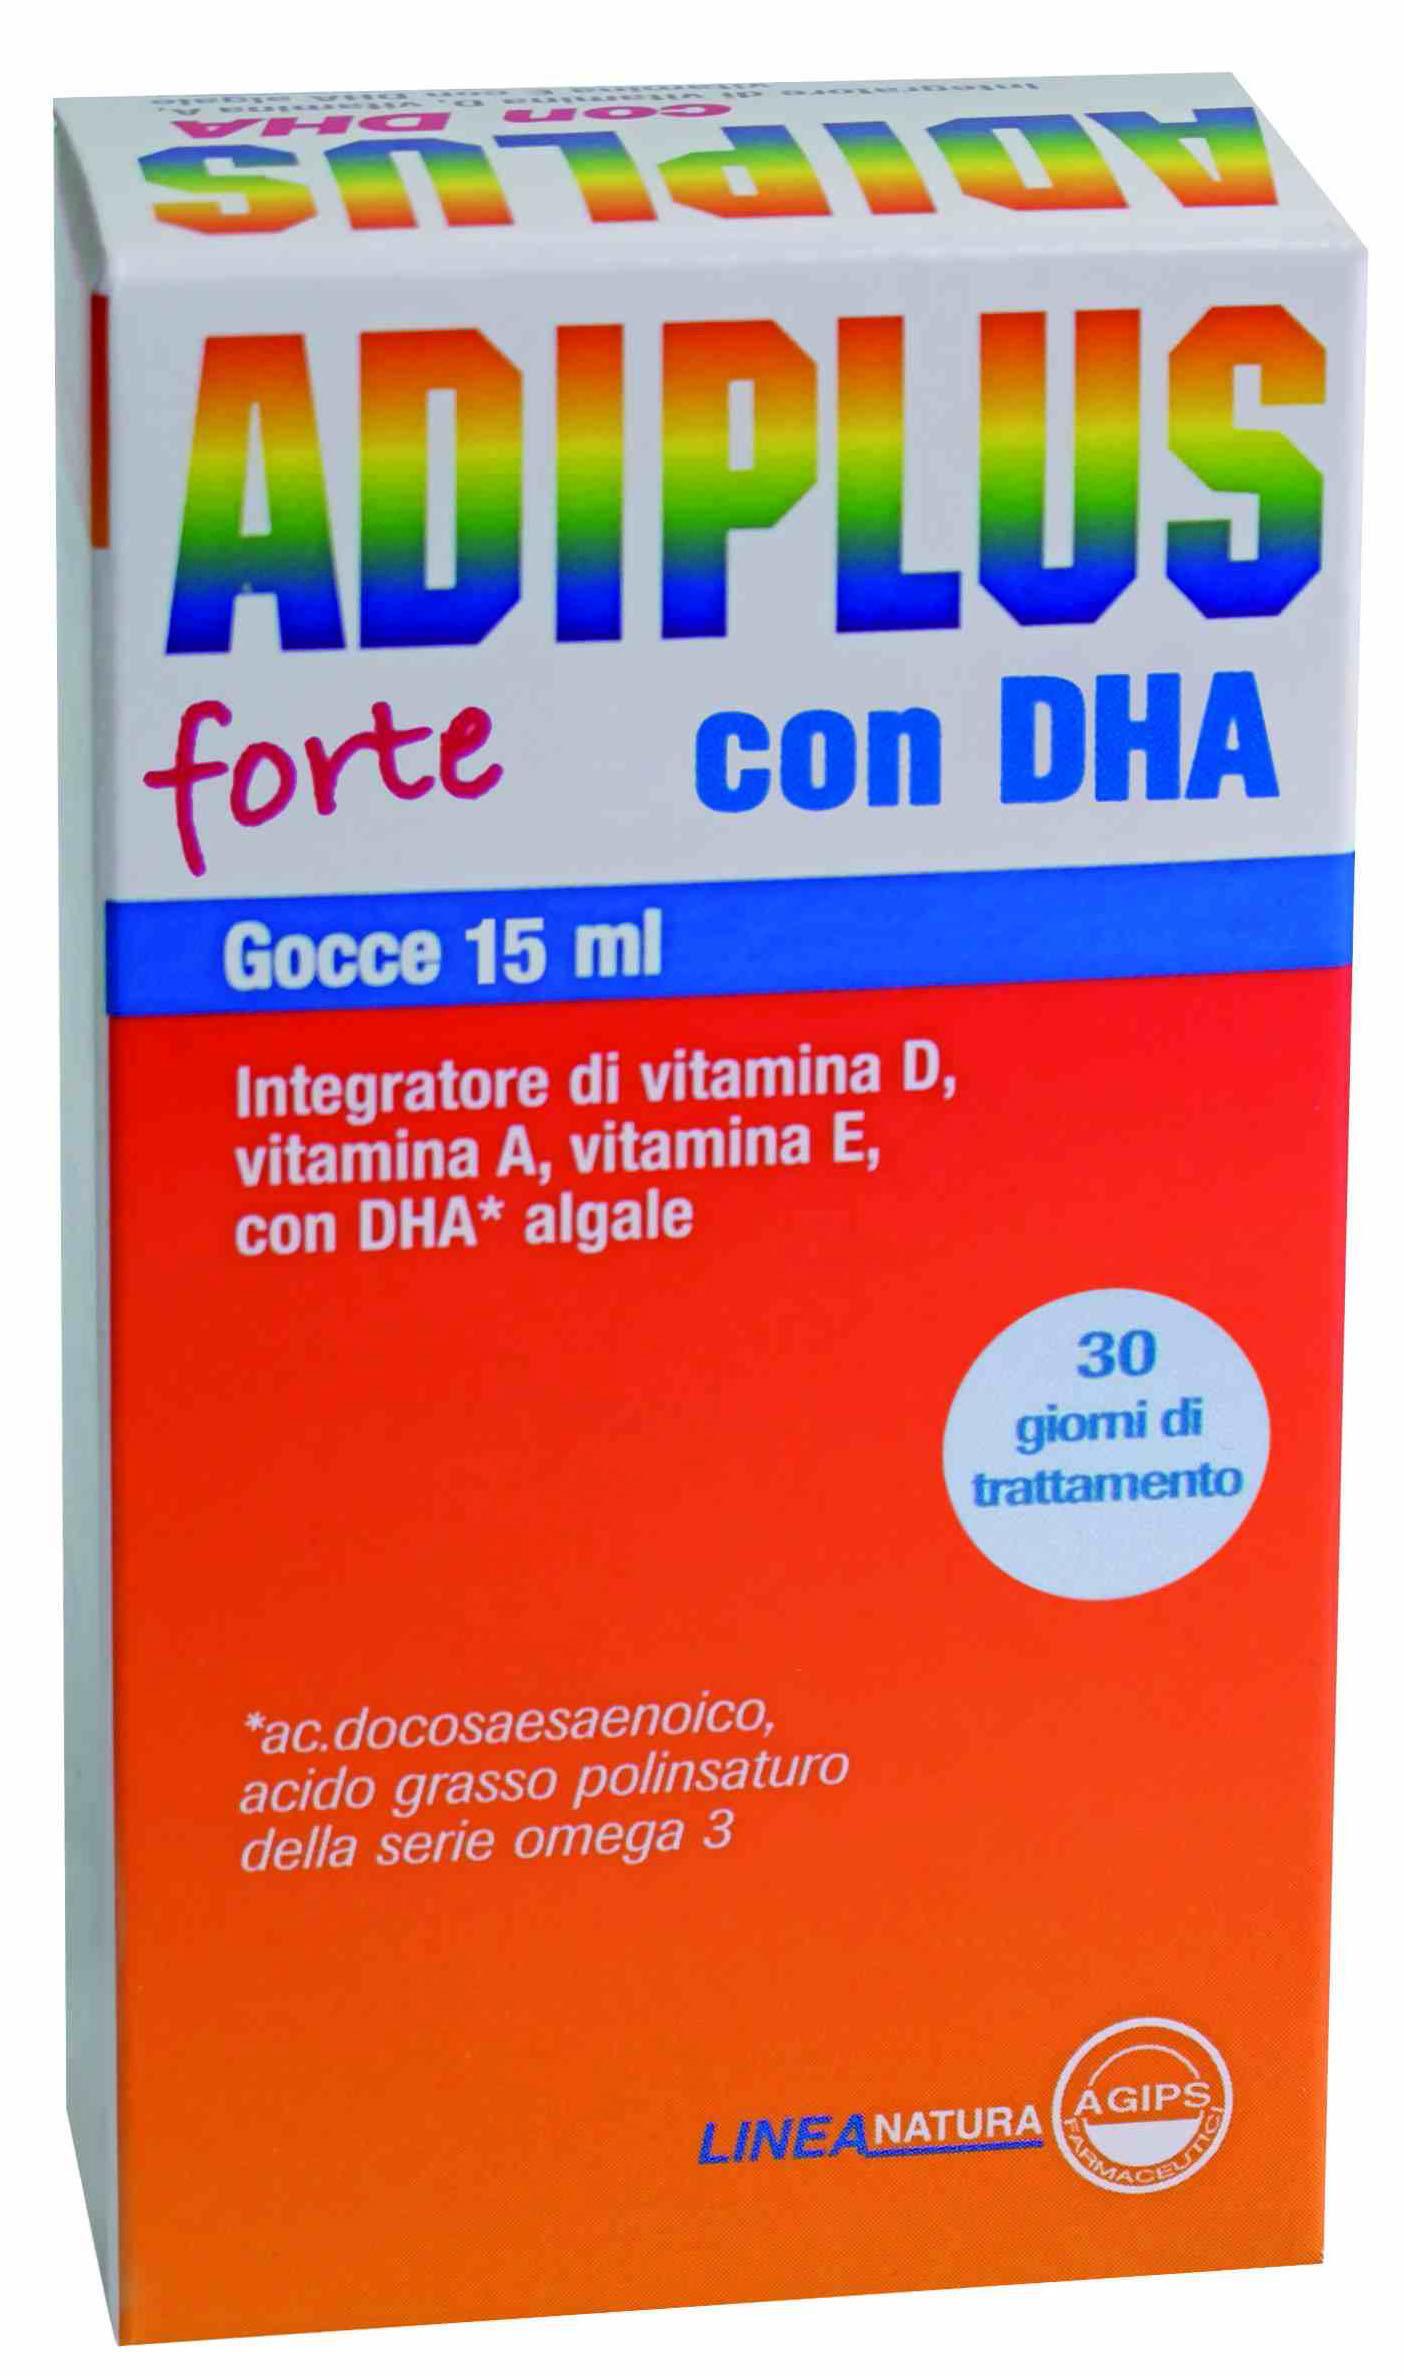 ADIPLUS forte con DHA Gocce